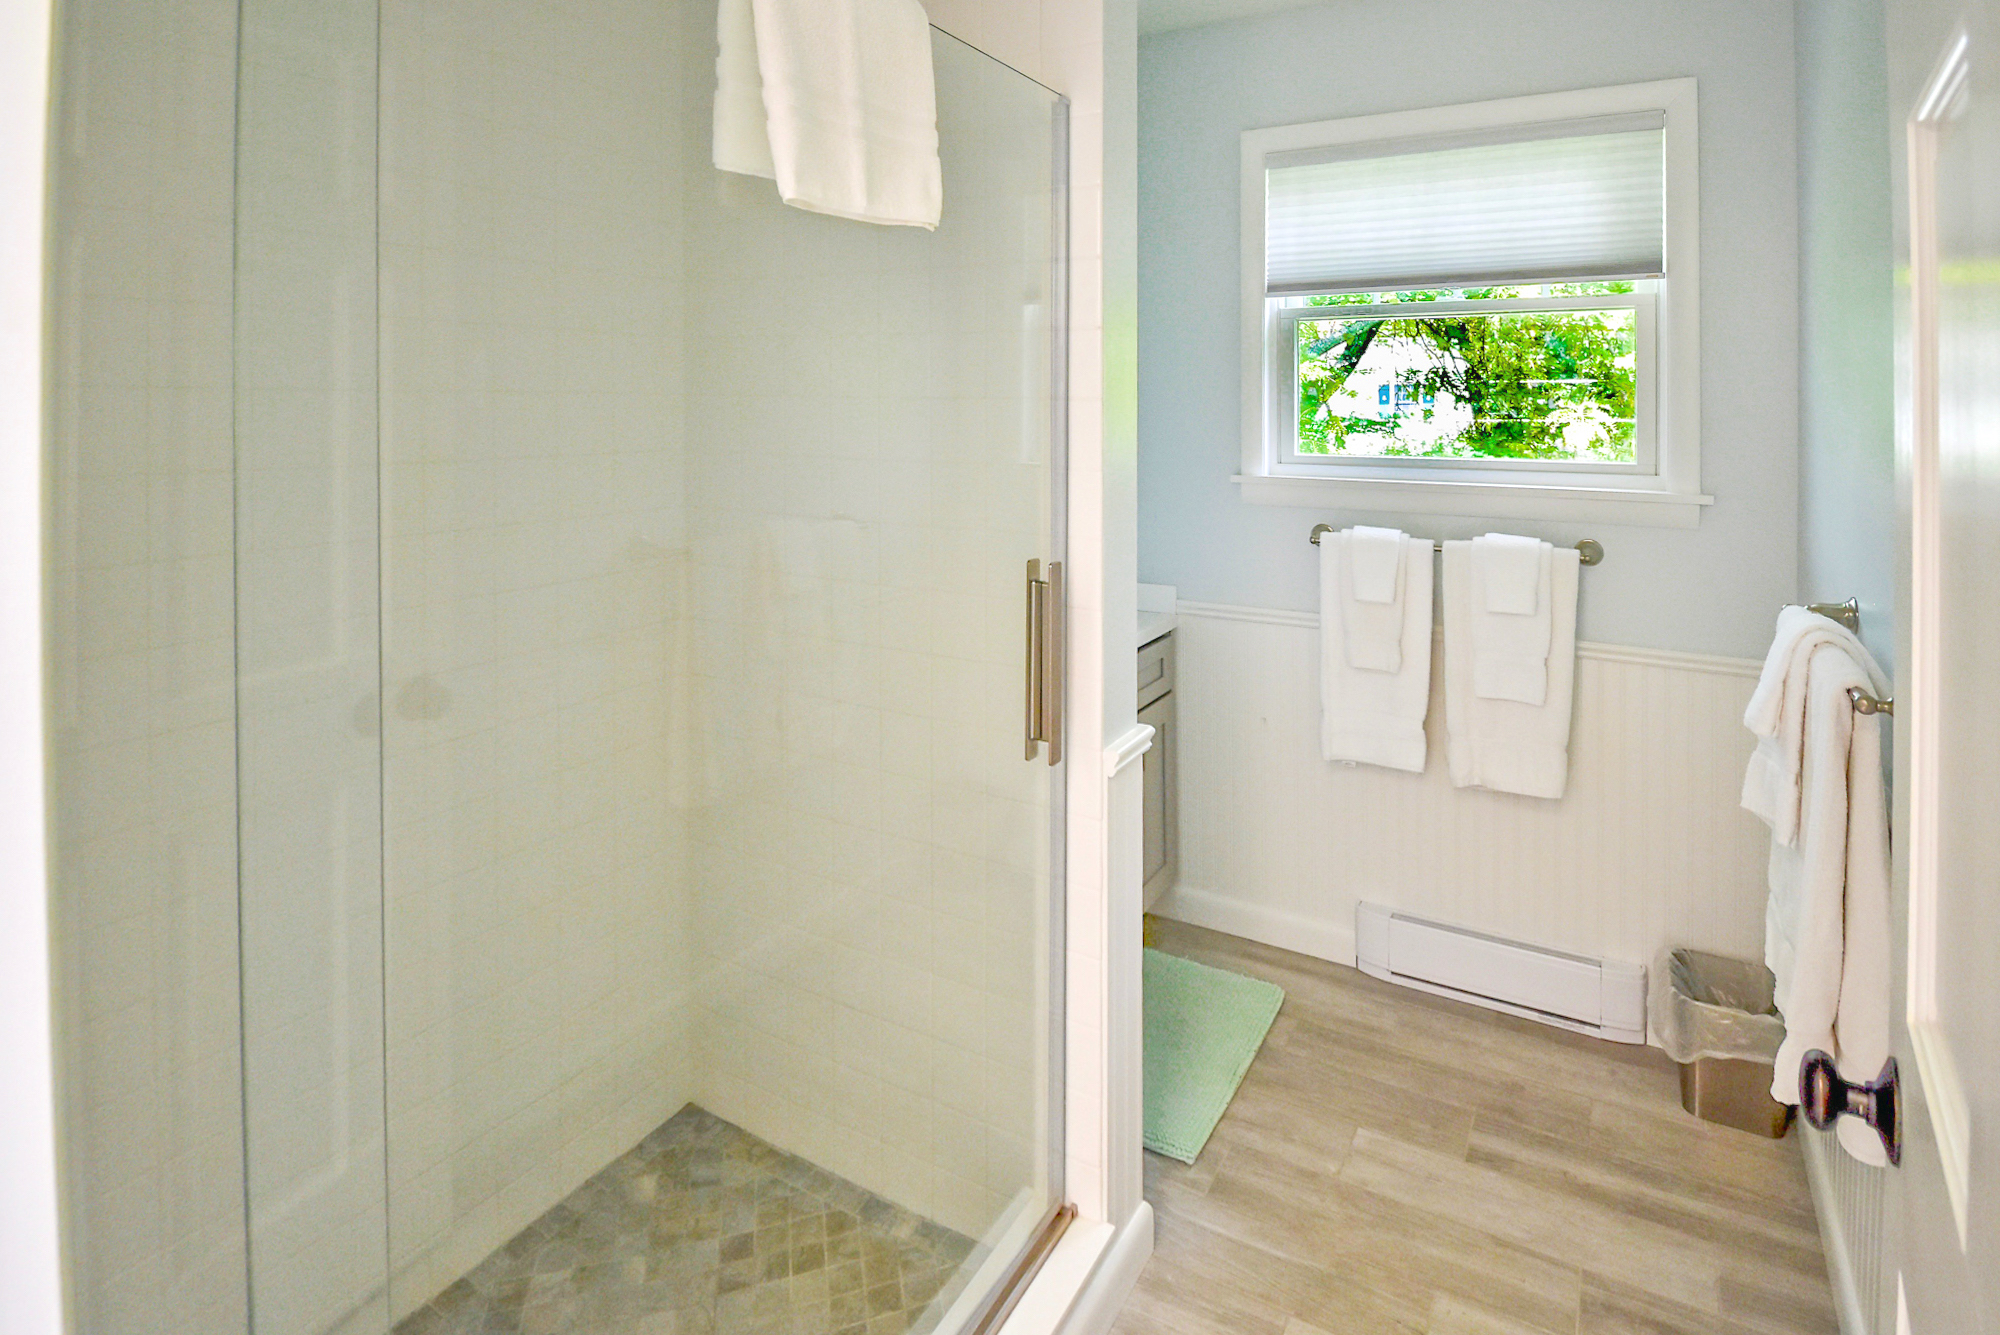 Takundewide Cottage #13 upstairs bathroom